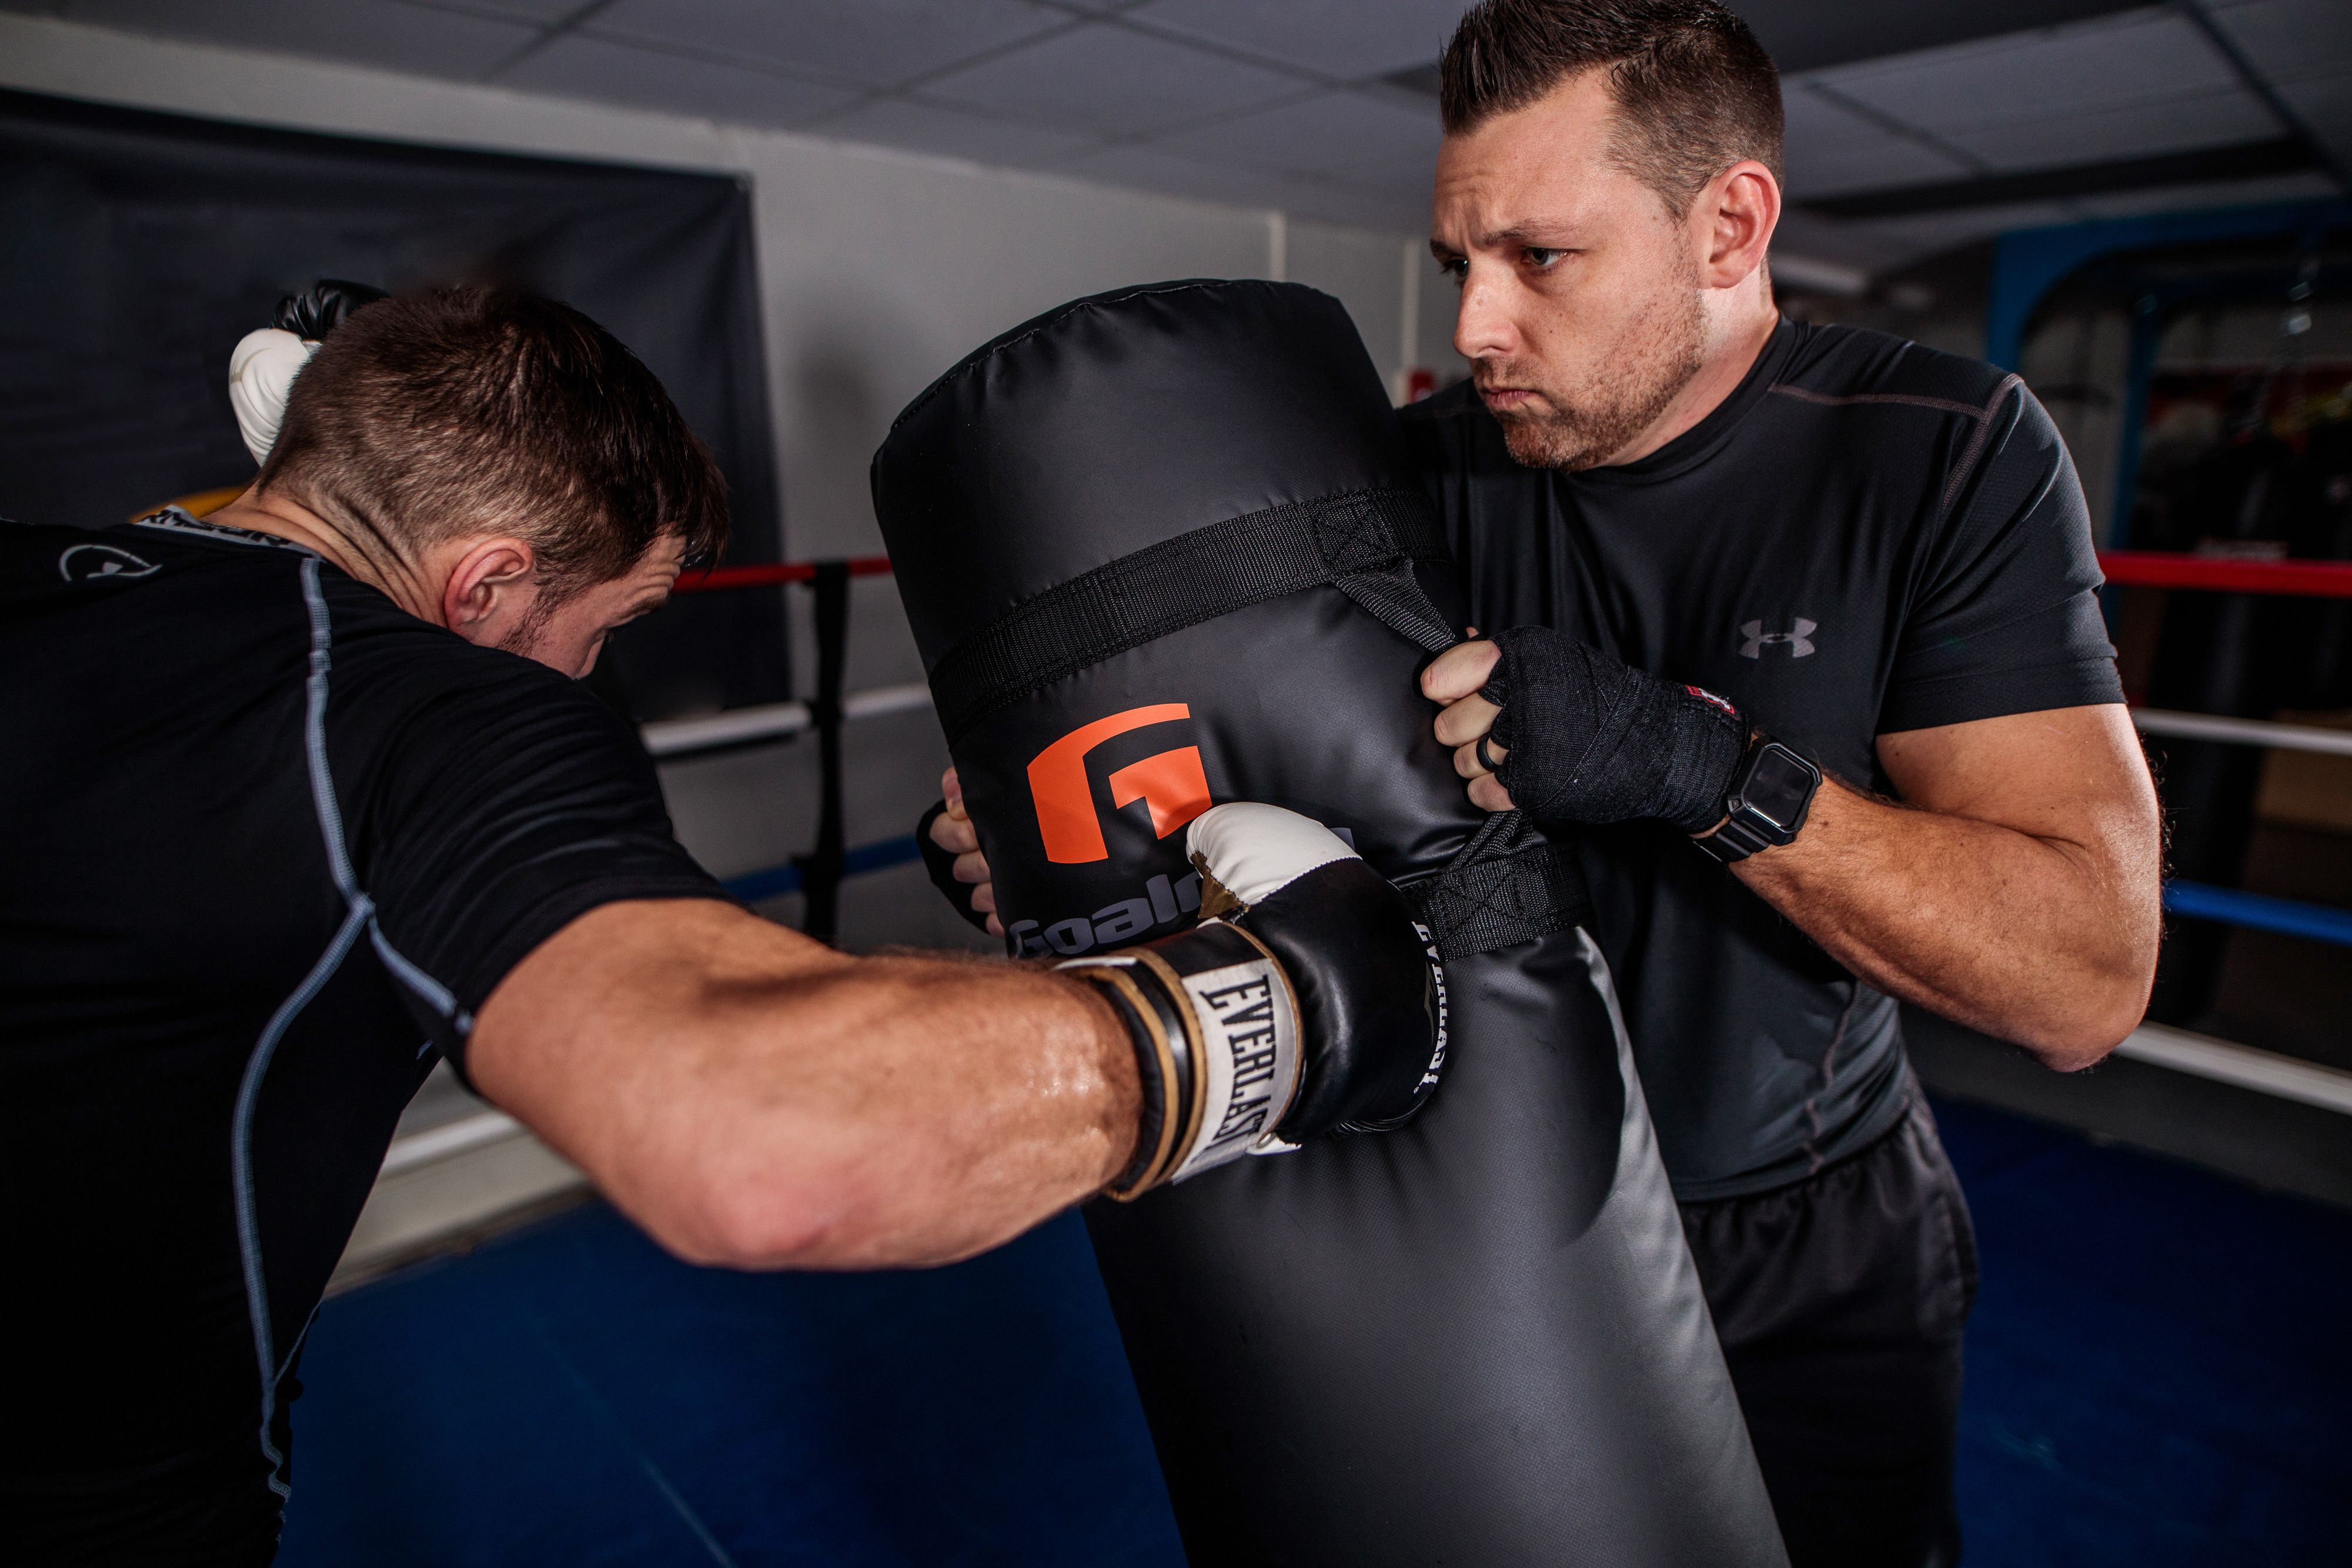 Goalrilla tackling dummy in 2020 kickboxing sports